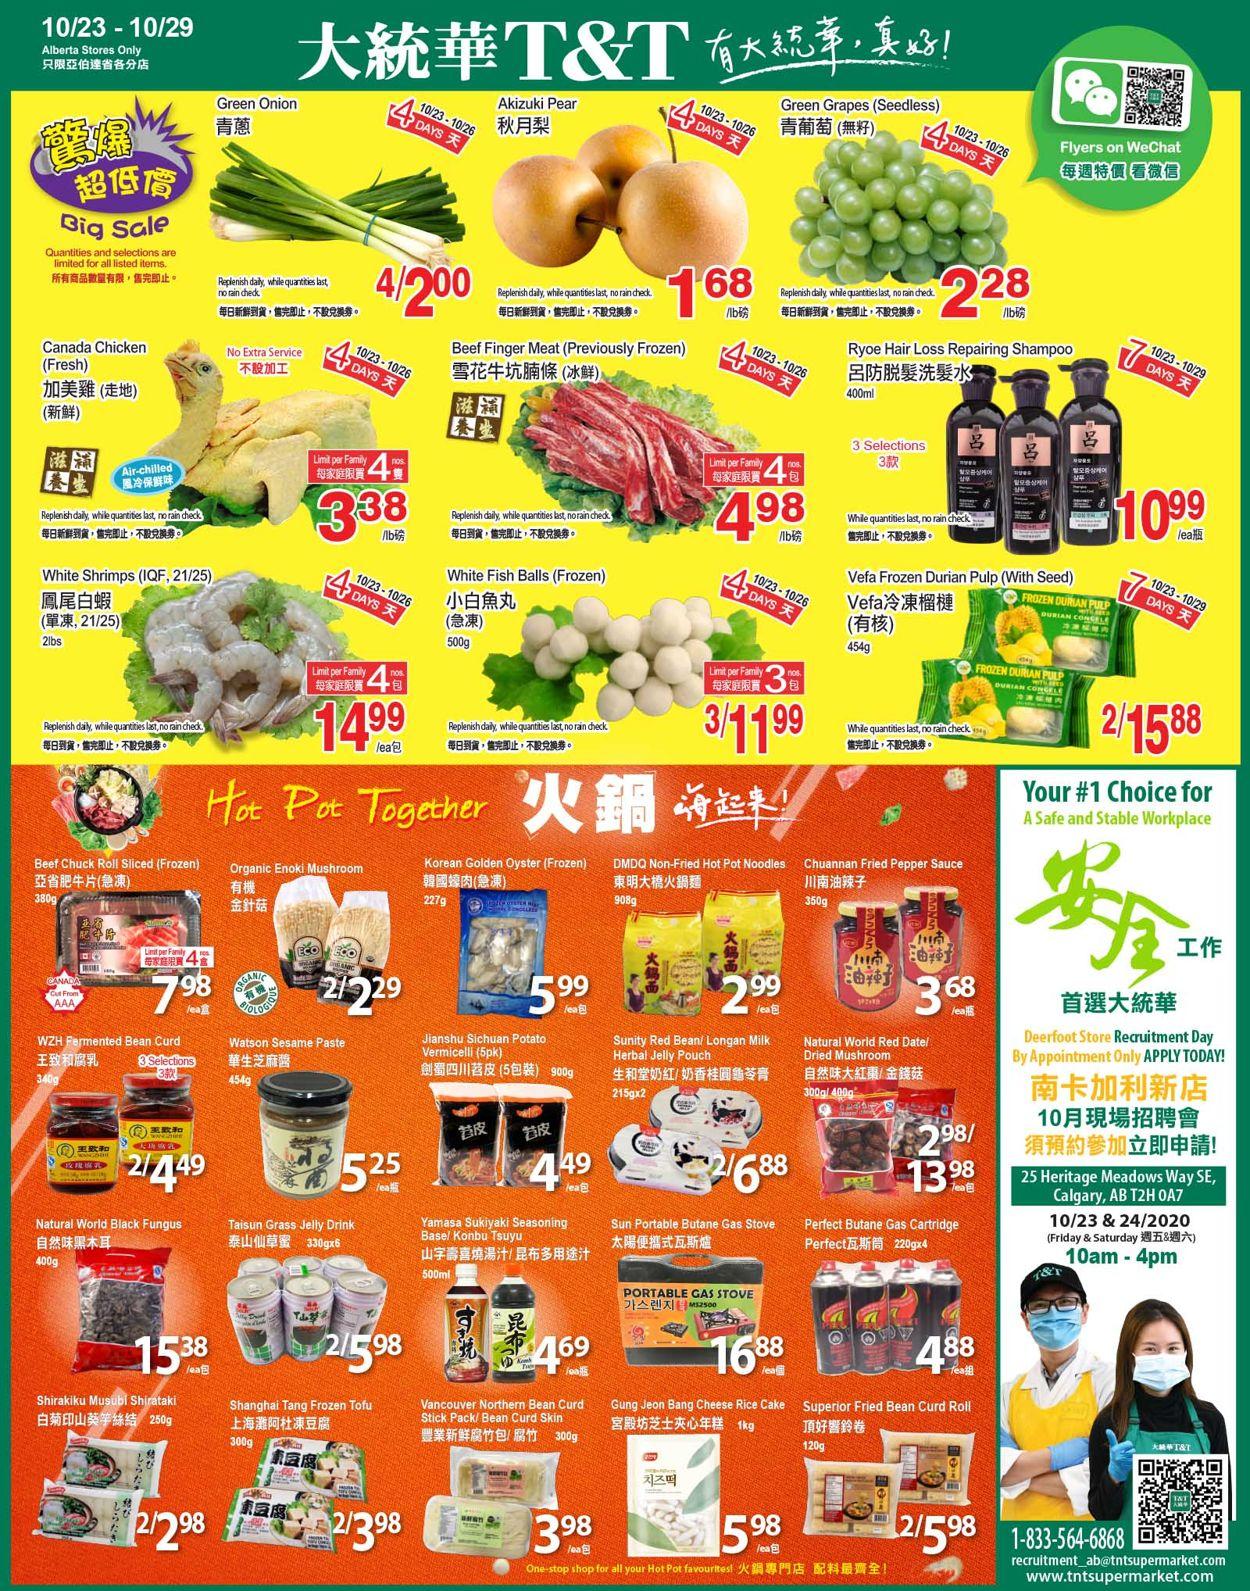 T&T Supermarket - Alberta Flyer - 10/23-10/29/2020